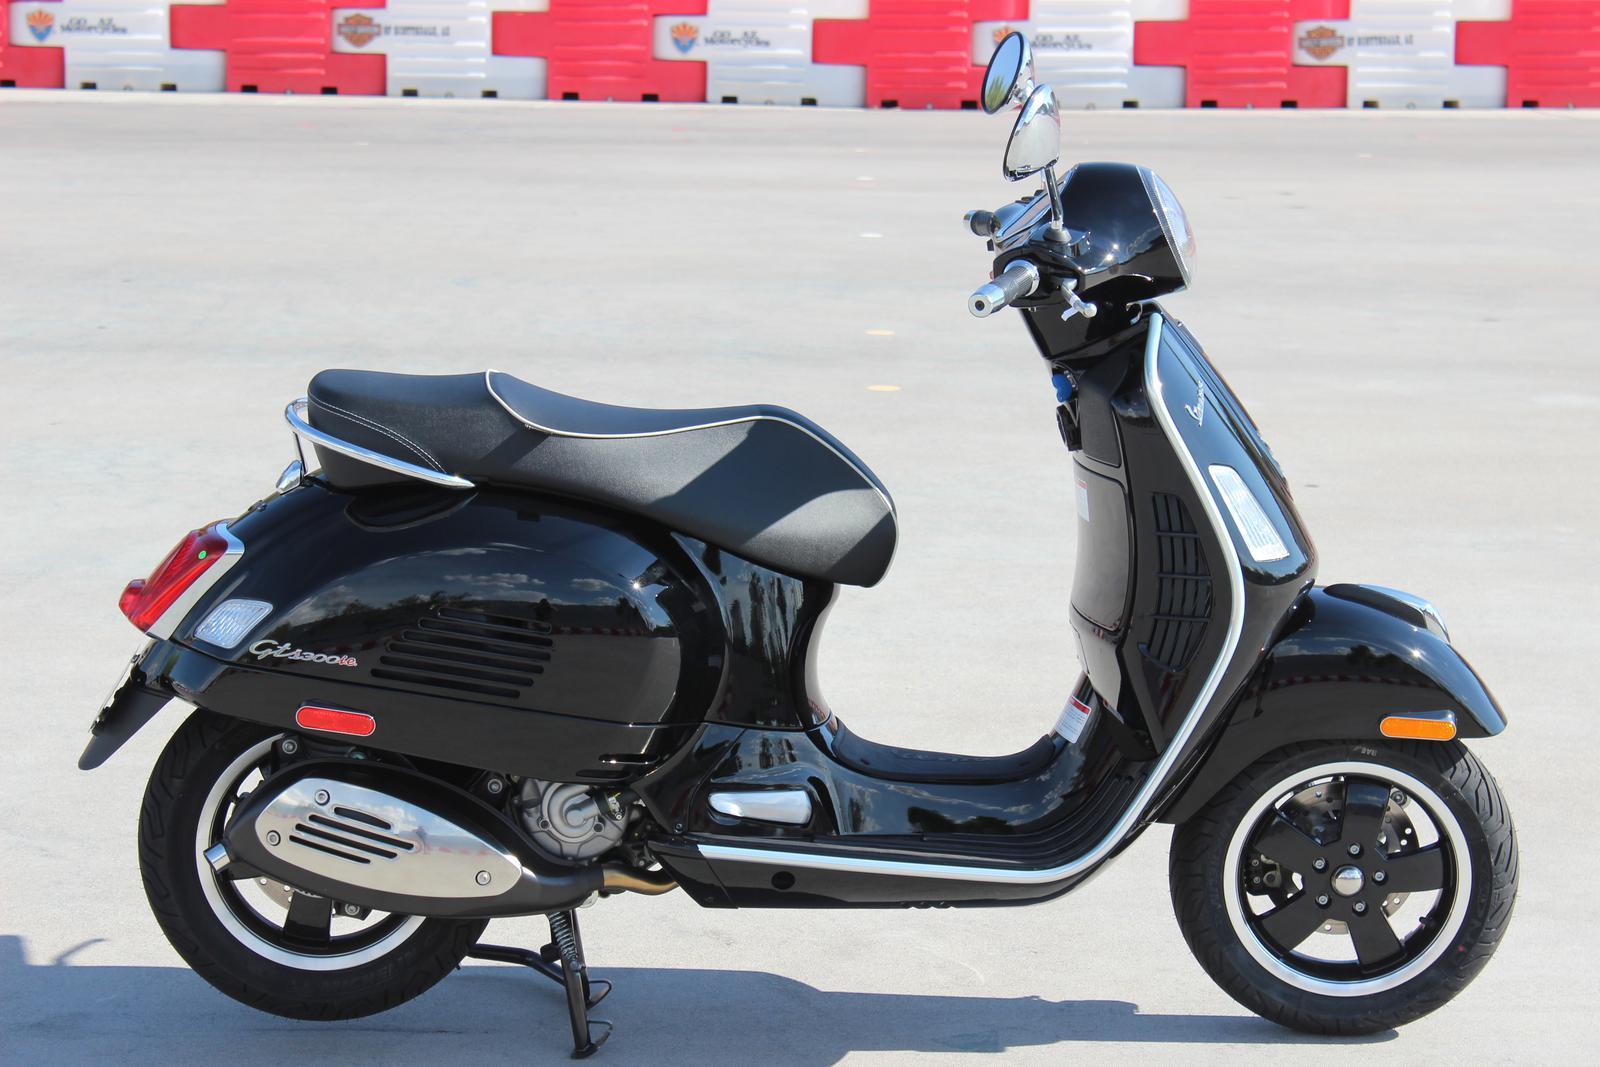 2017 Vespa Gts 300 Super Abs Go Az Motorcycles In Scottsdale